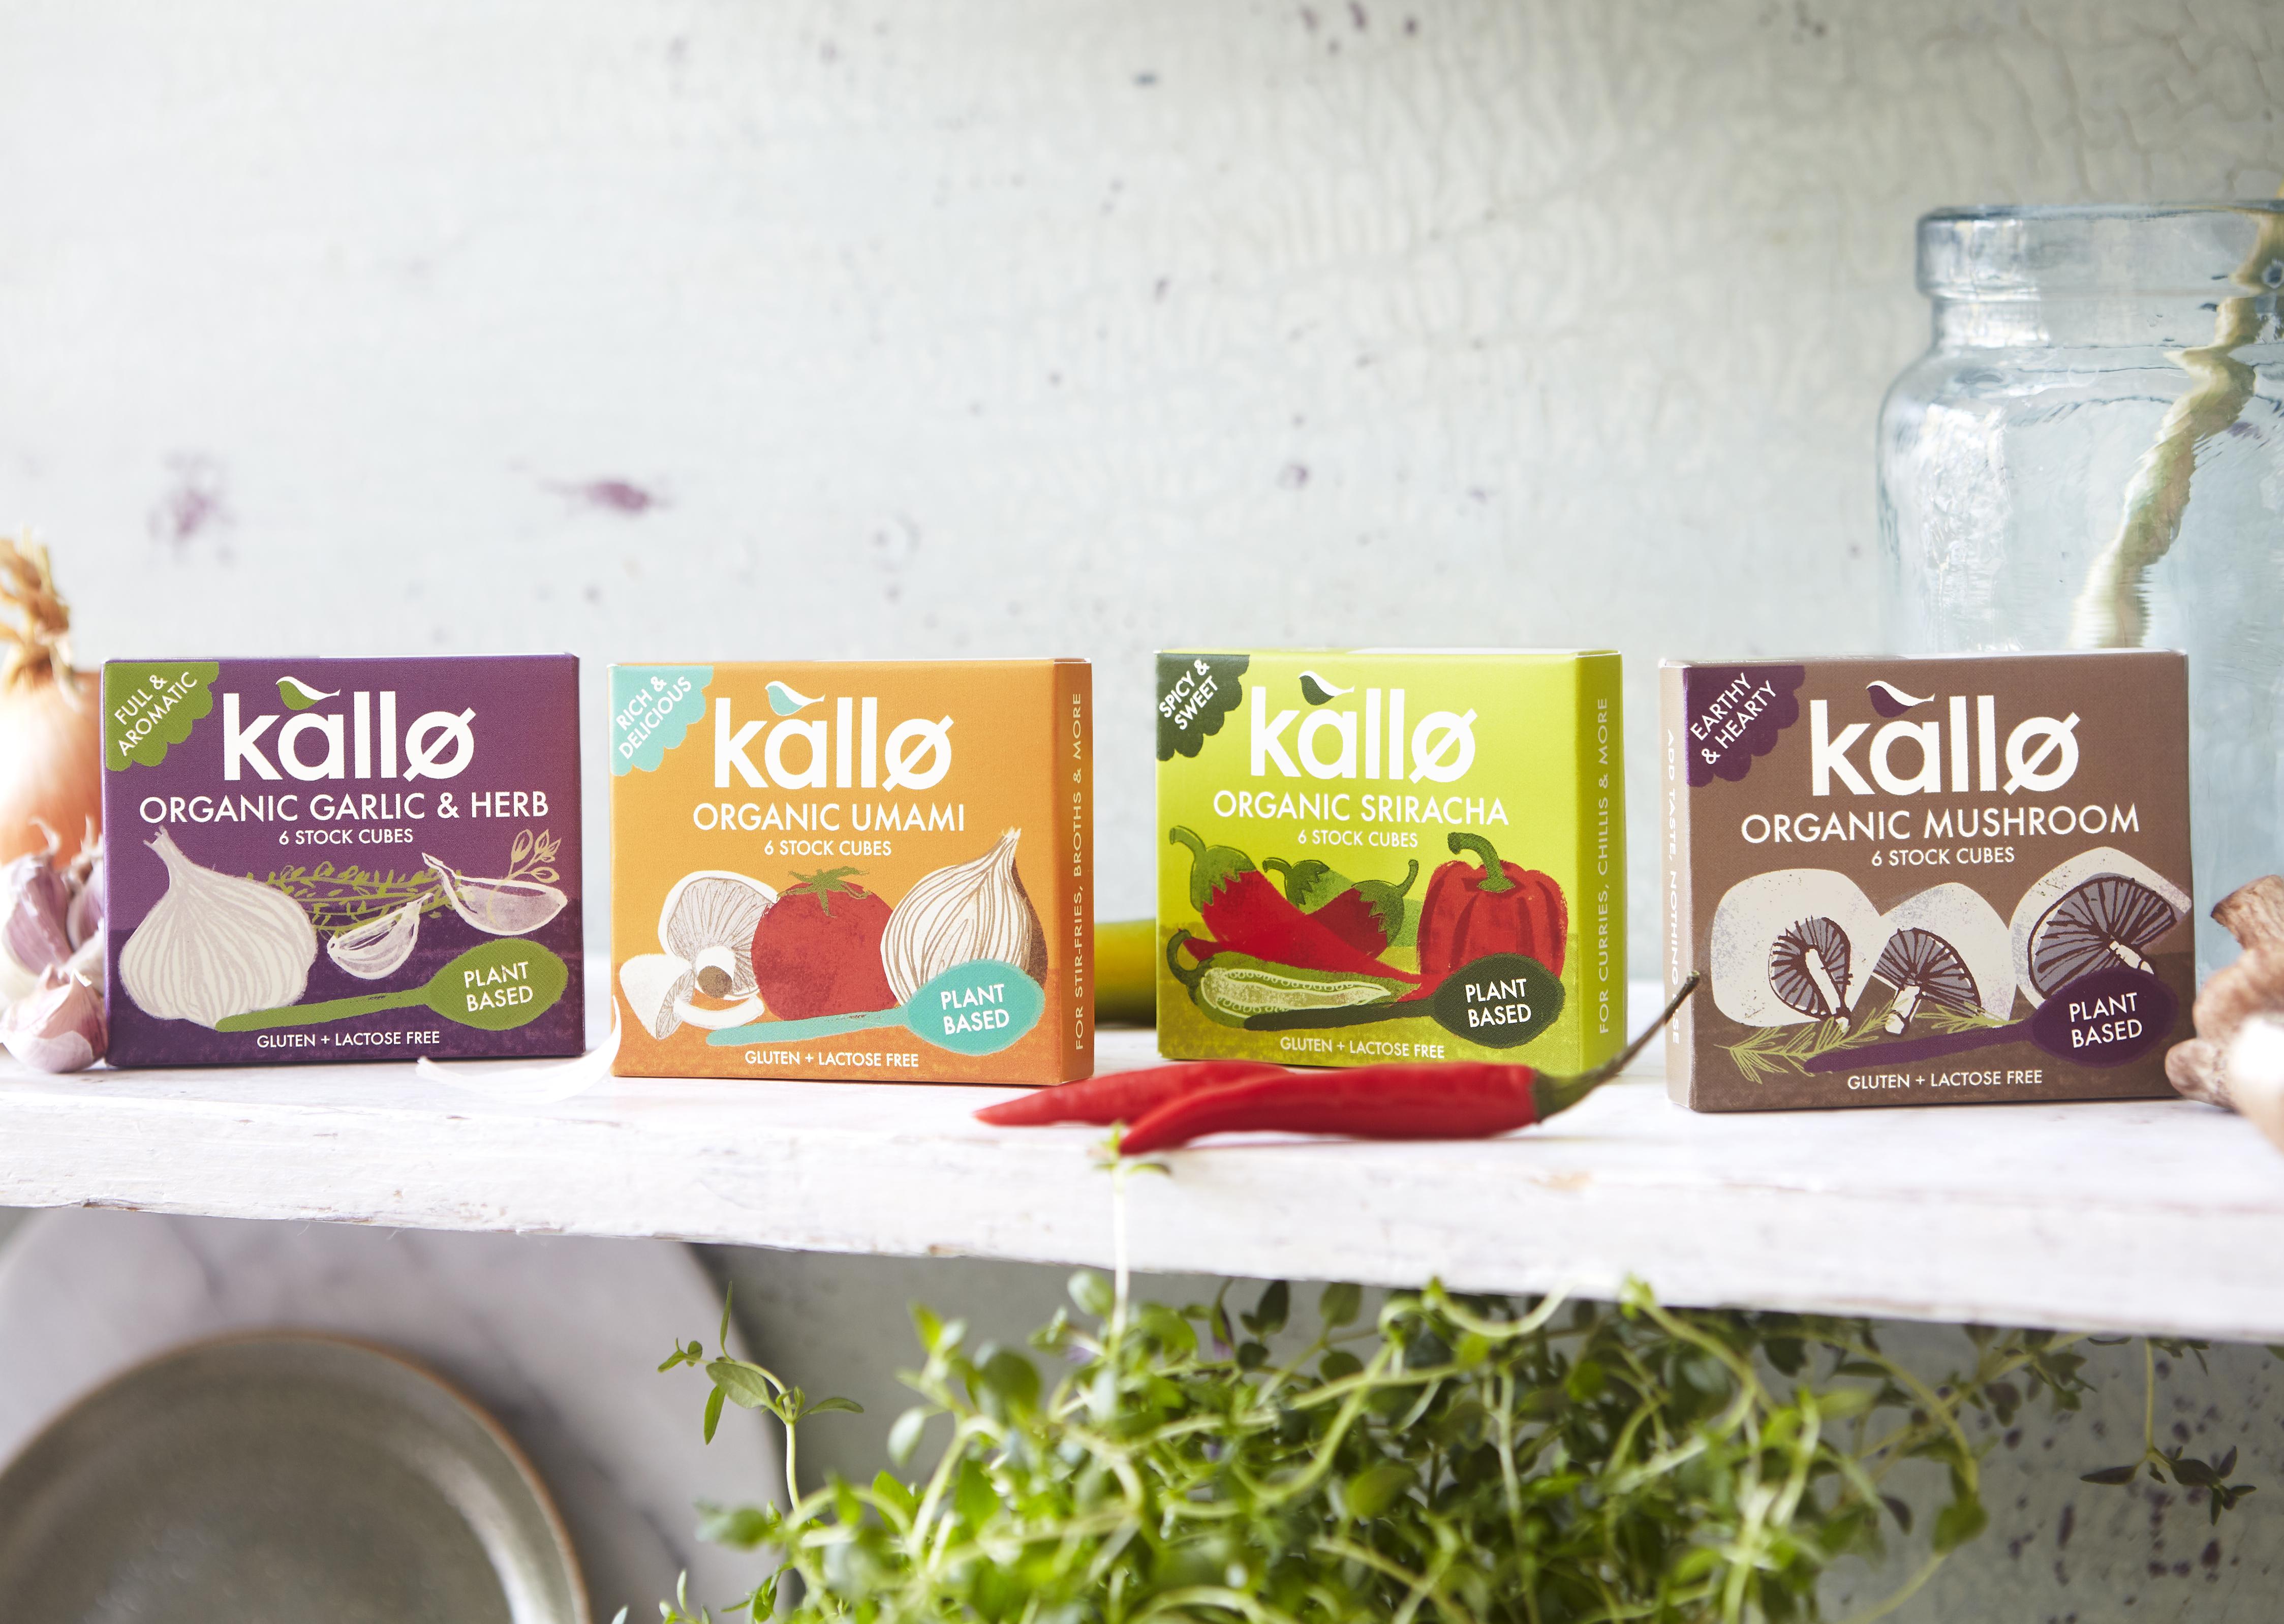 I've tried Kallo's Organic Umami stock